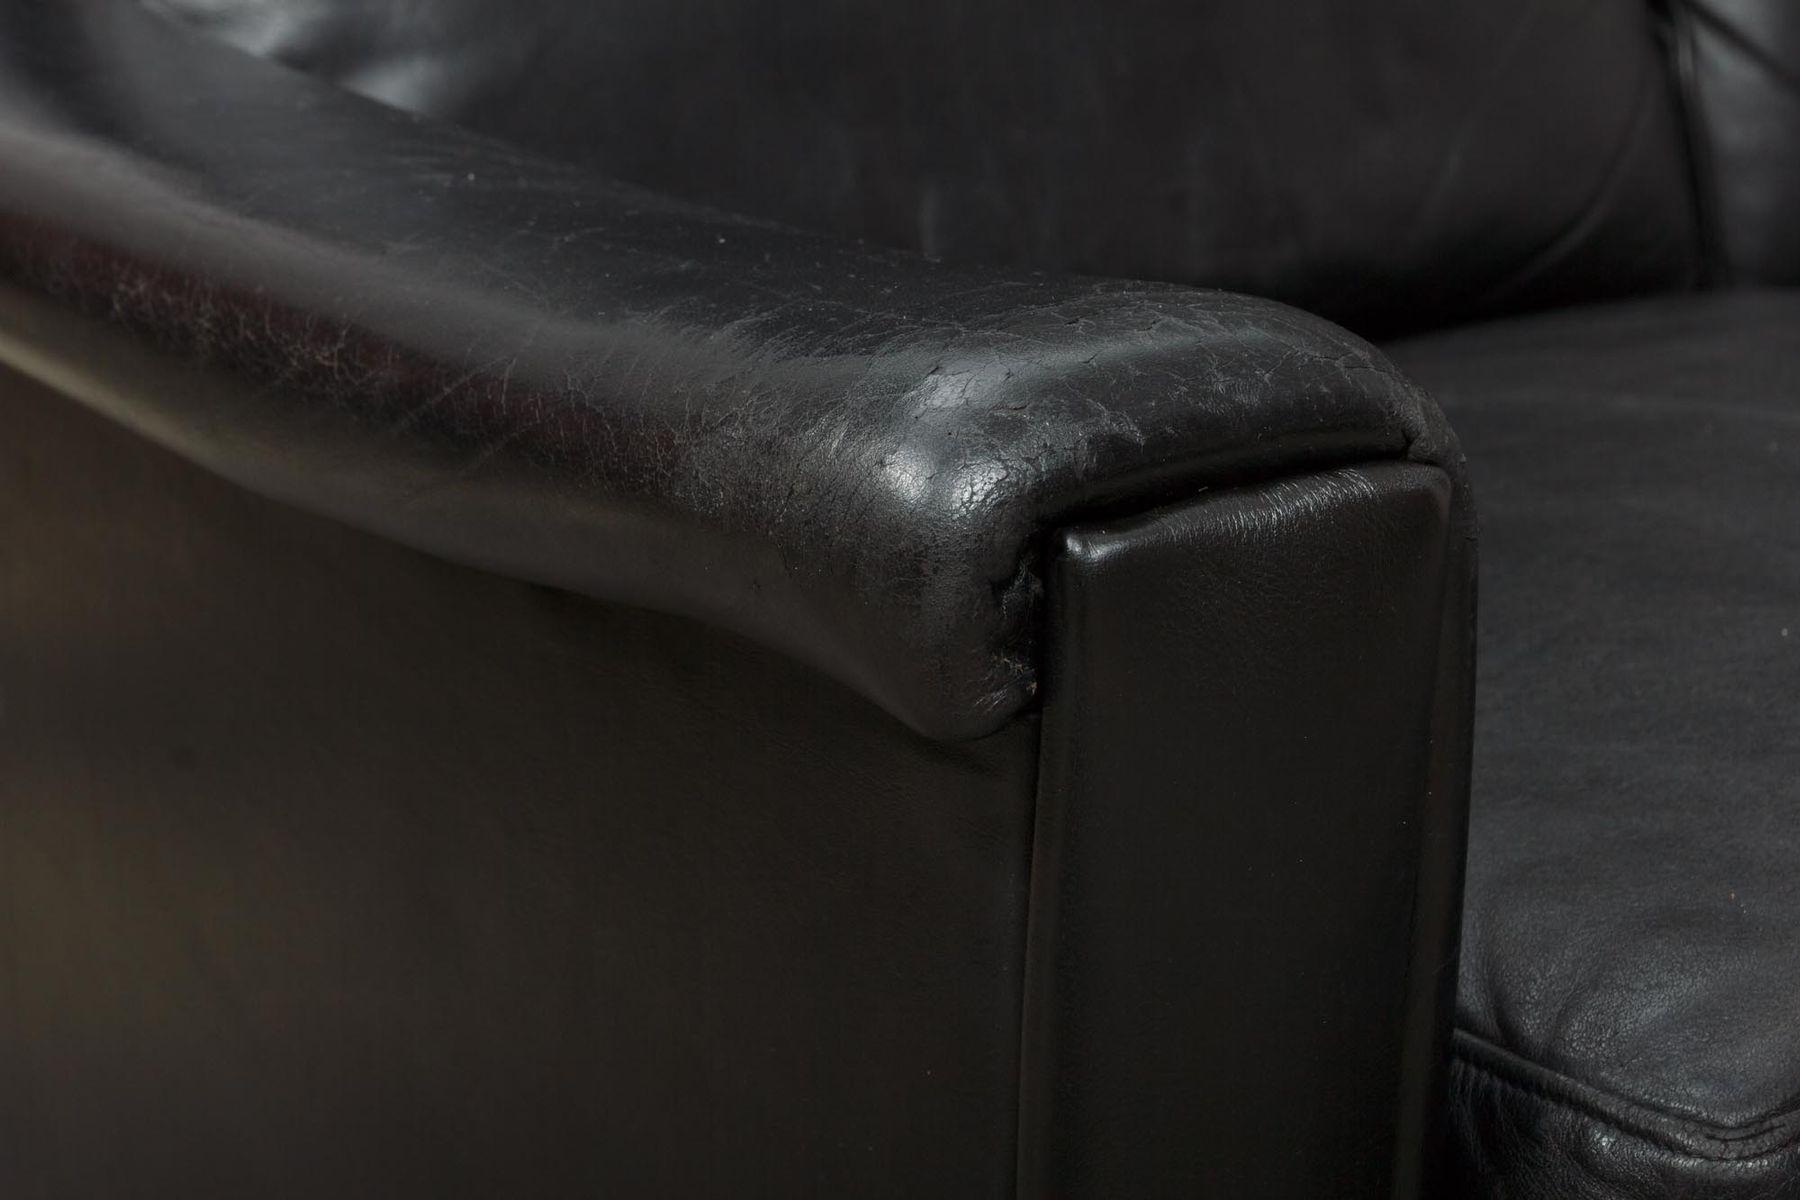 schwarzes vier sitzer ledersofa 1960er bei pamono kaufen. Black Bedroom Furniture Sets. Home Design Ideas